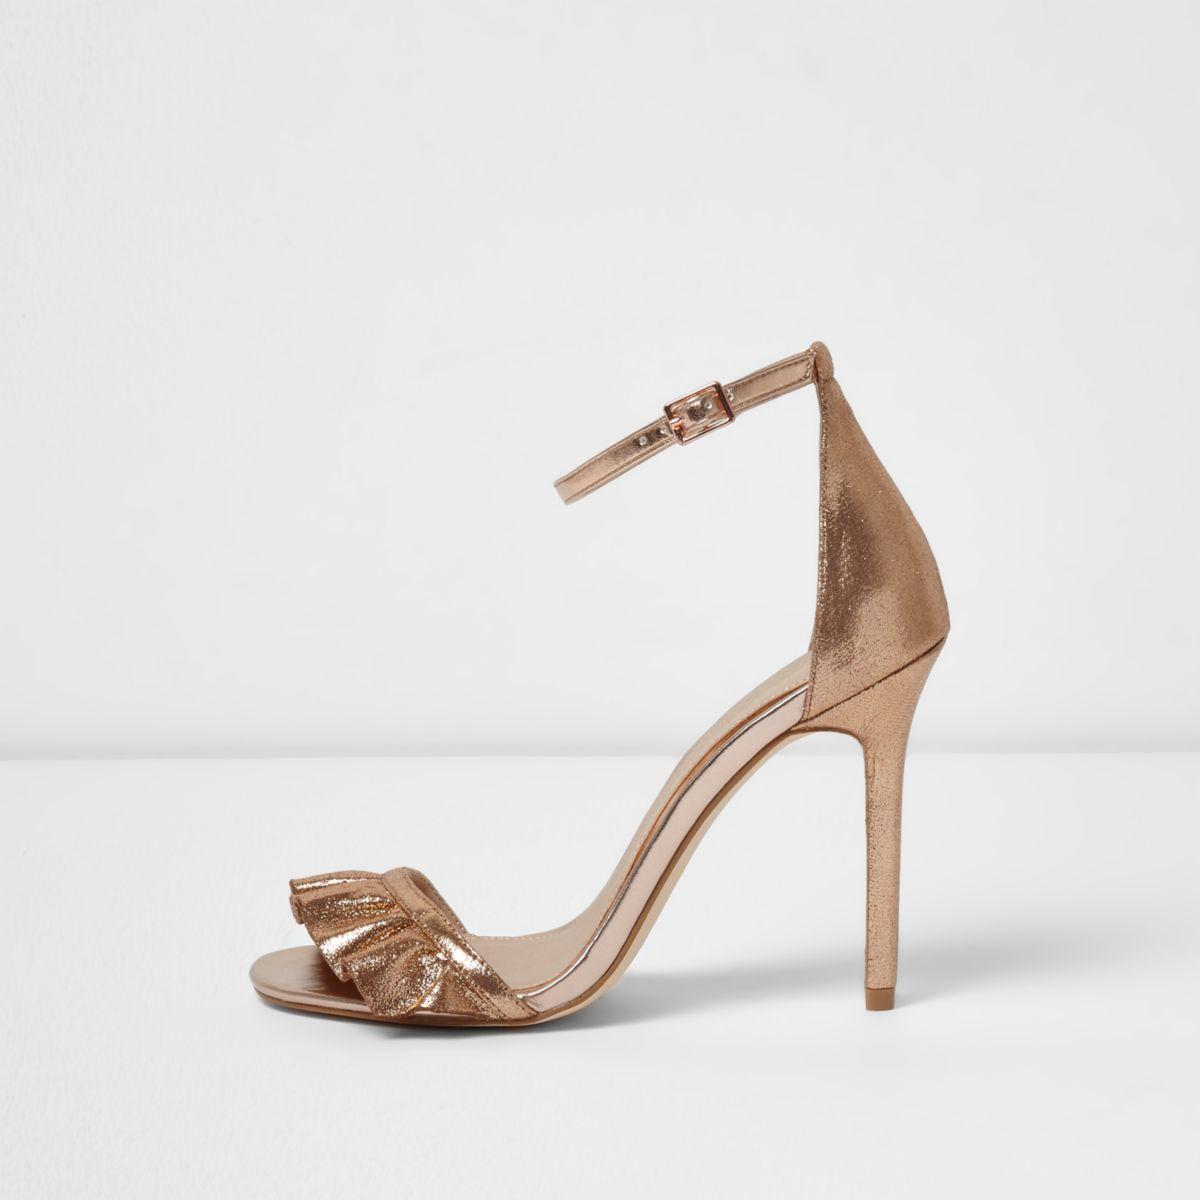 River Island Sandals Sale